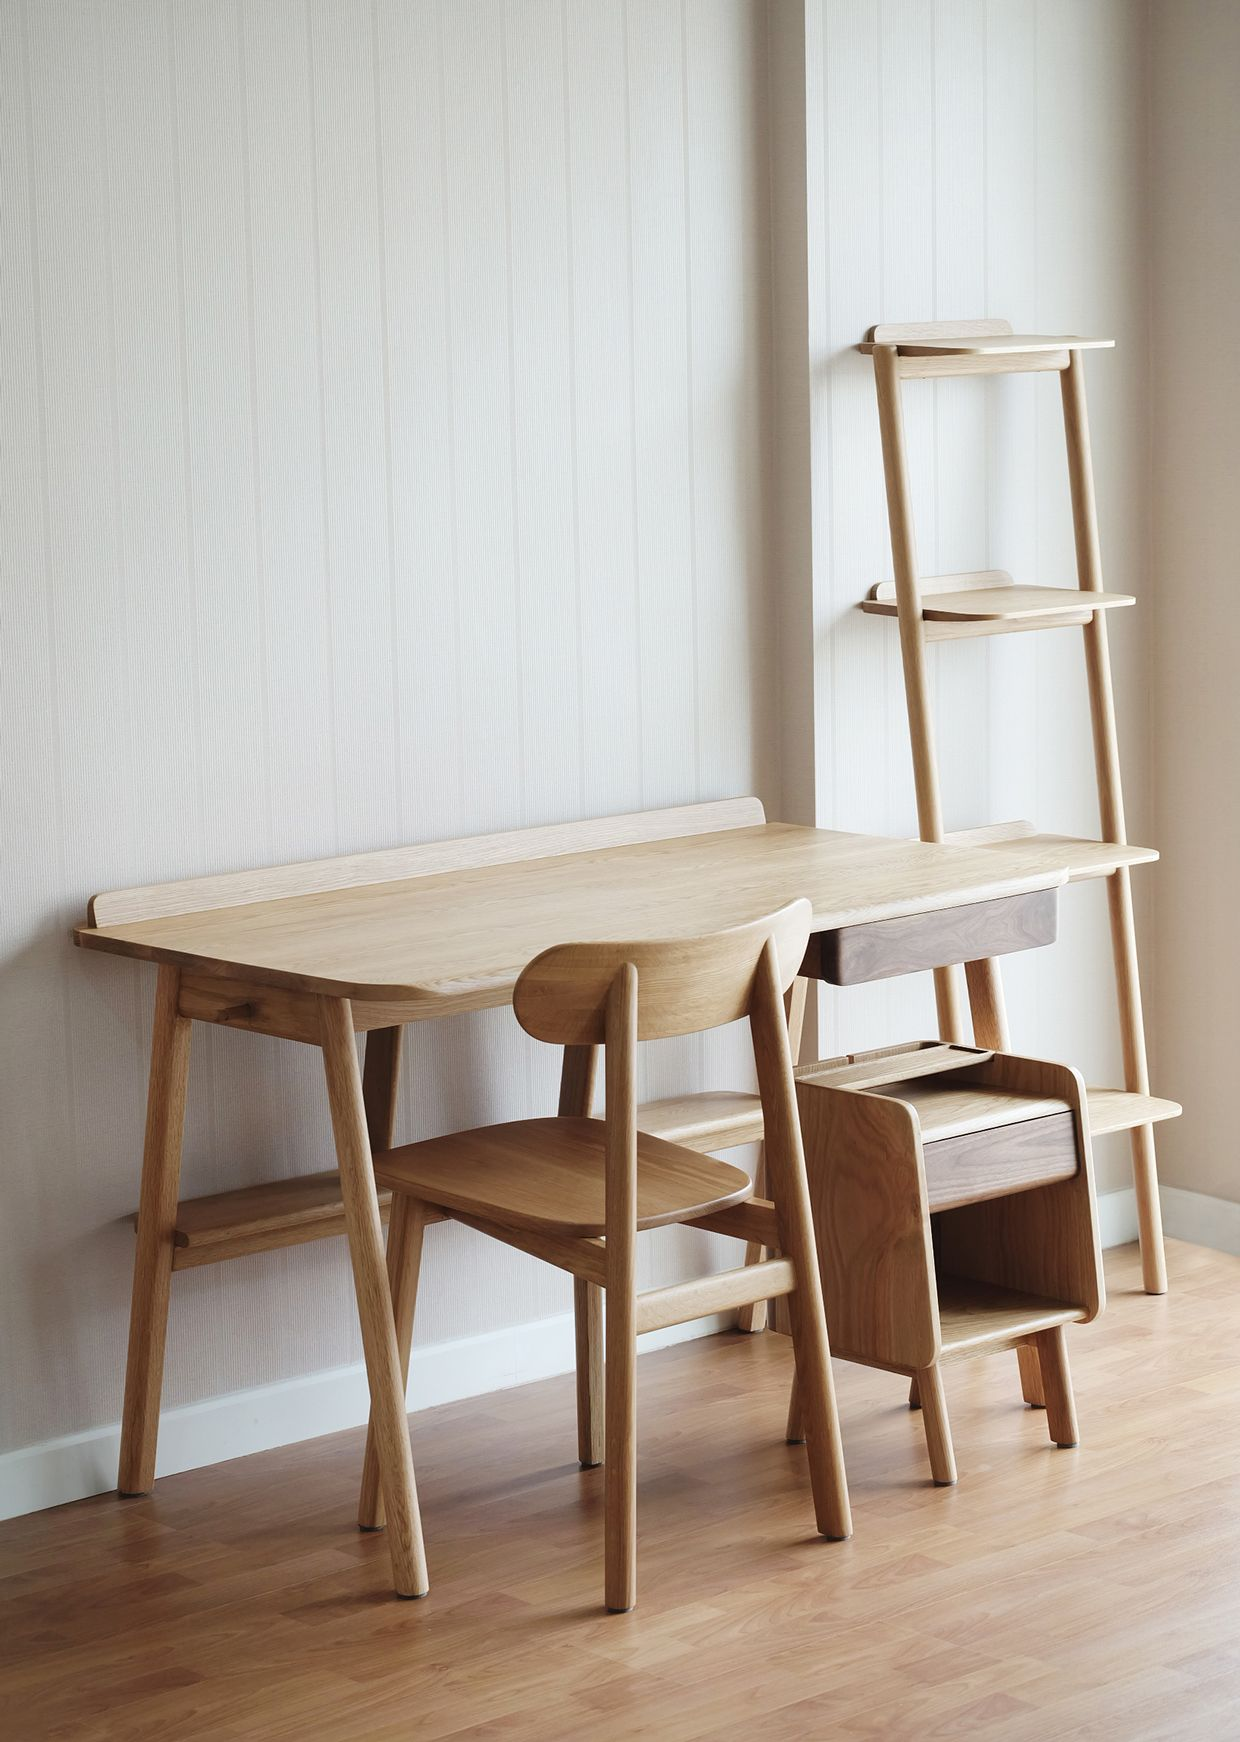 Ambiance Et Deco Idron 347 best bucket cabinet / side cupboard 斗柜 / 单柜 / 边柜